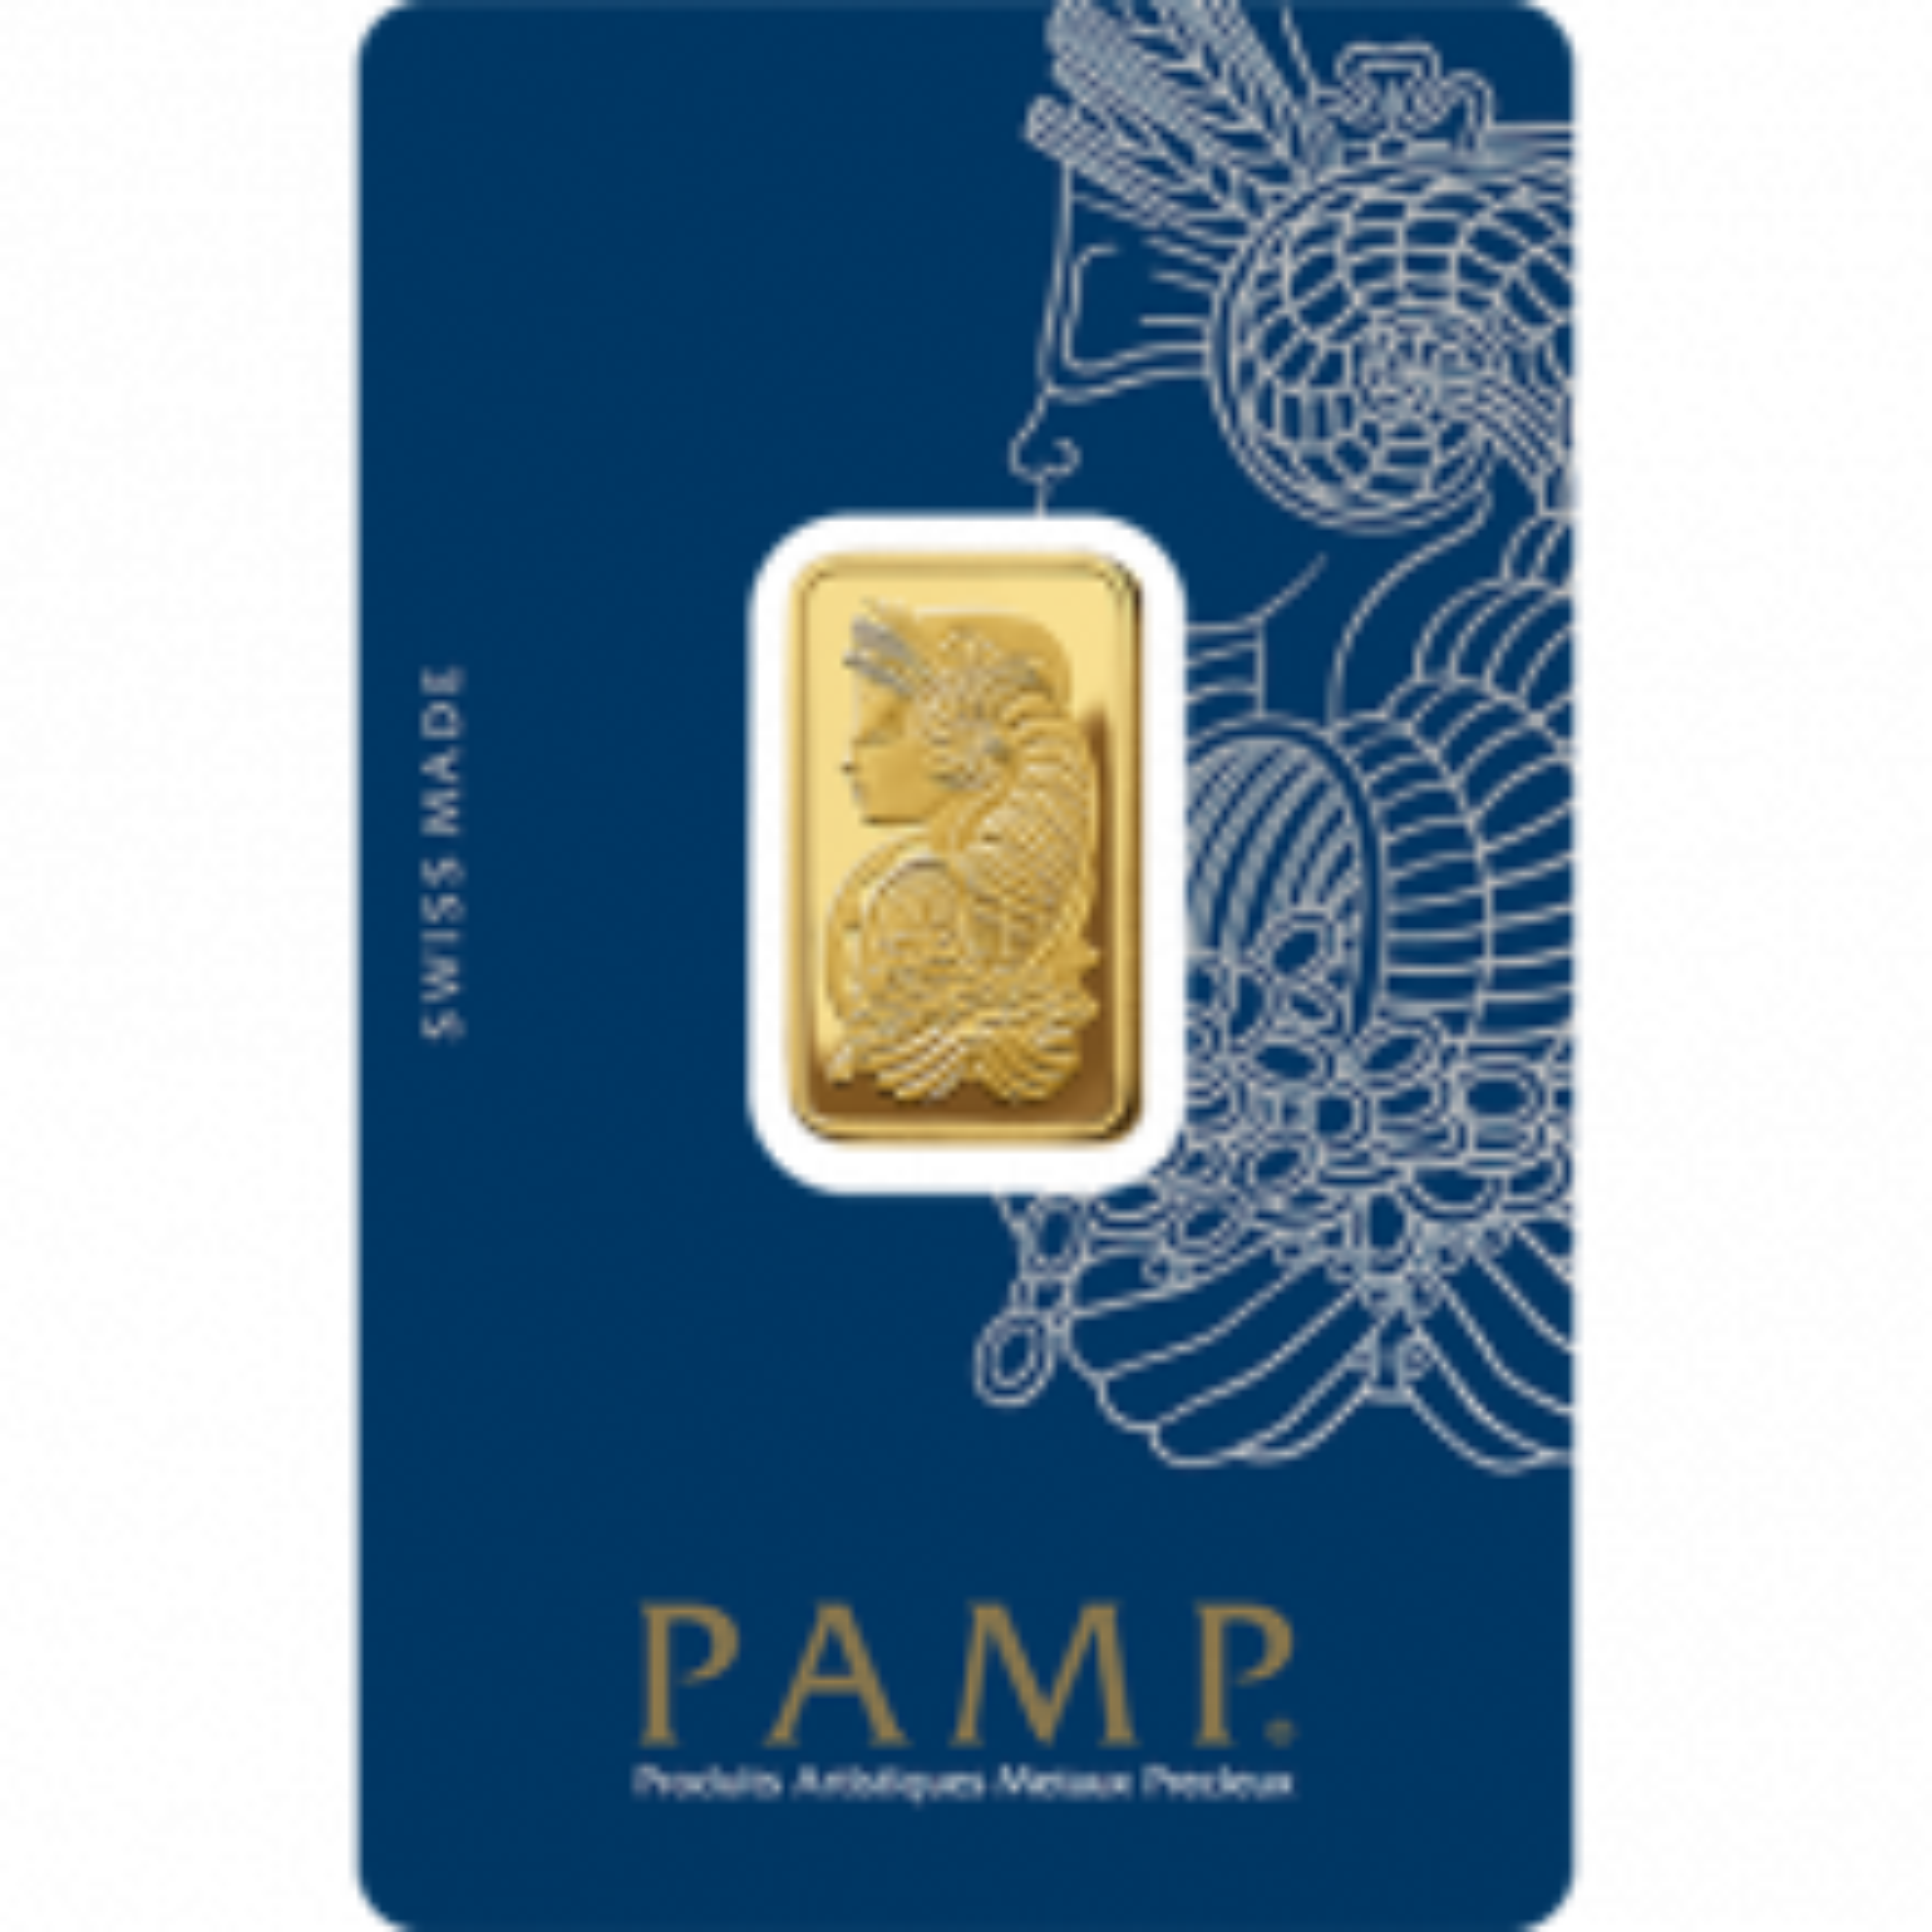 10 grams gold bar Pamp Suisse Fortuna